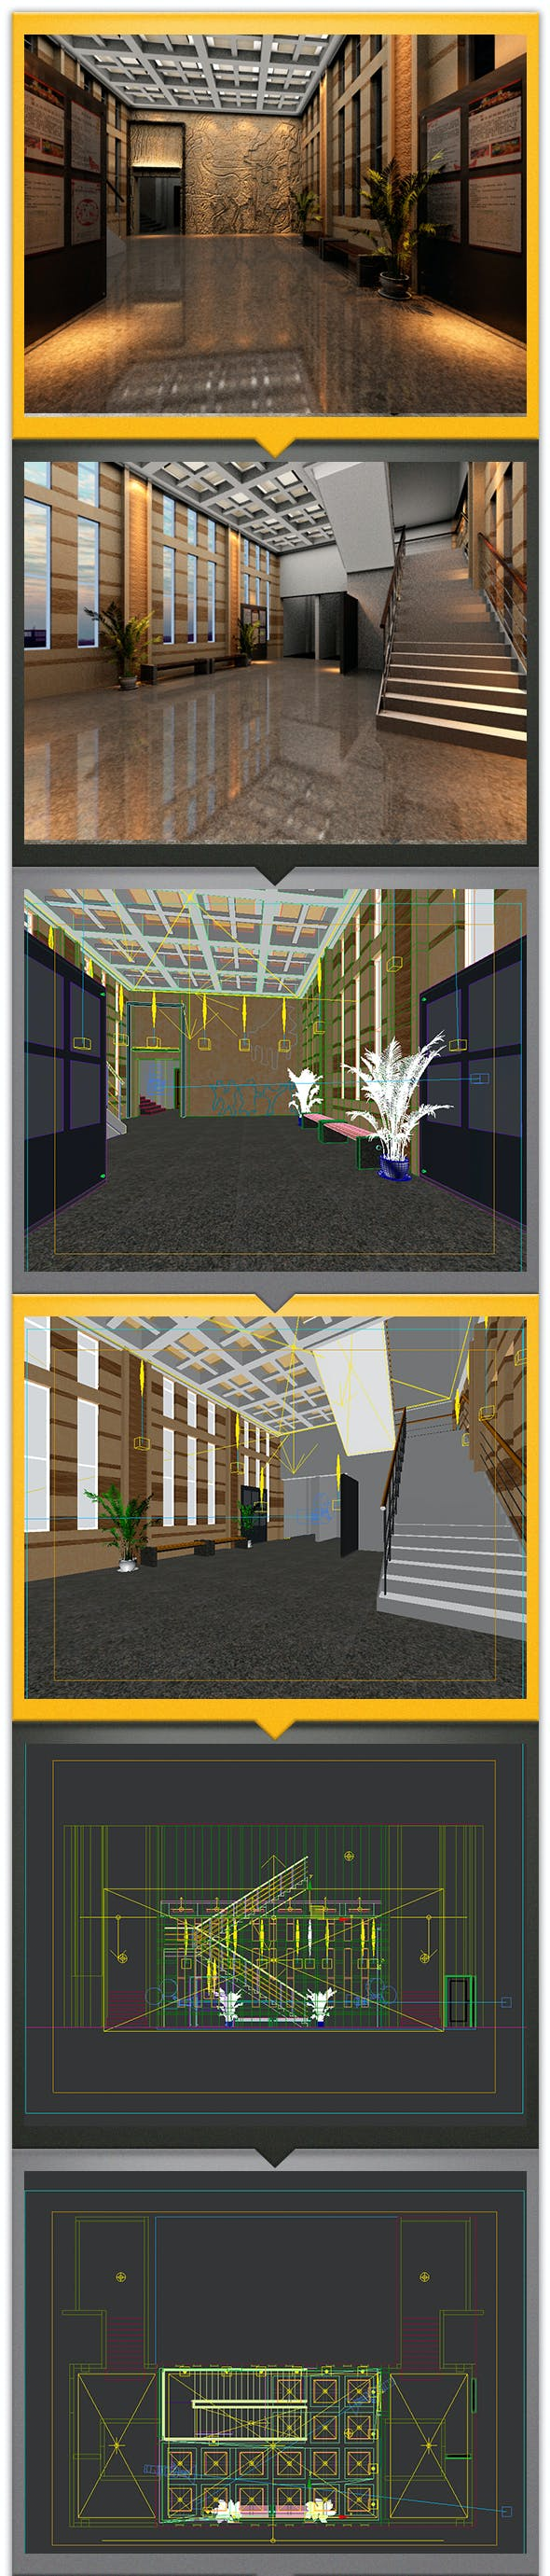 exhibition interiors - 3DOcean Item for Sale